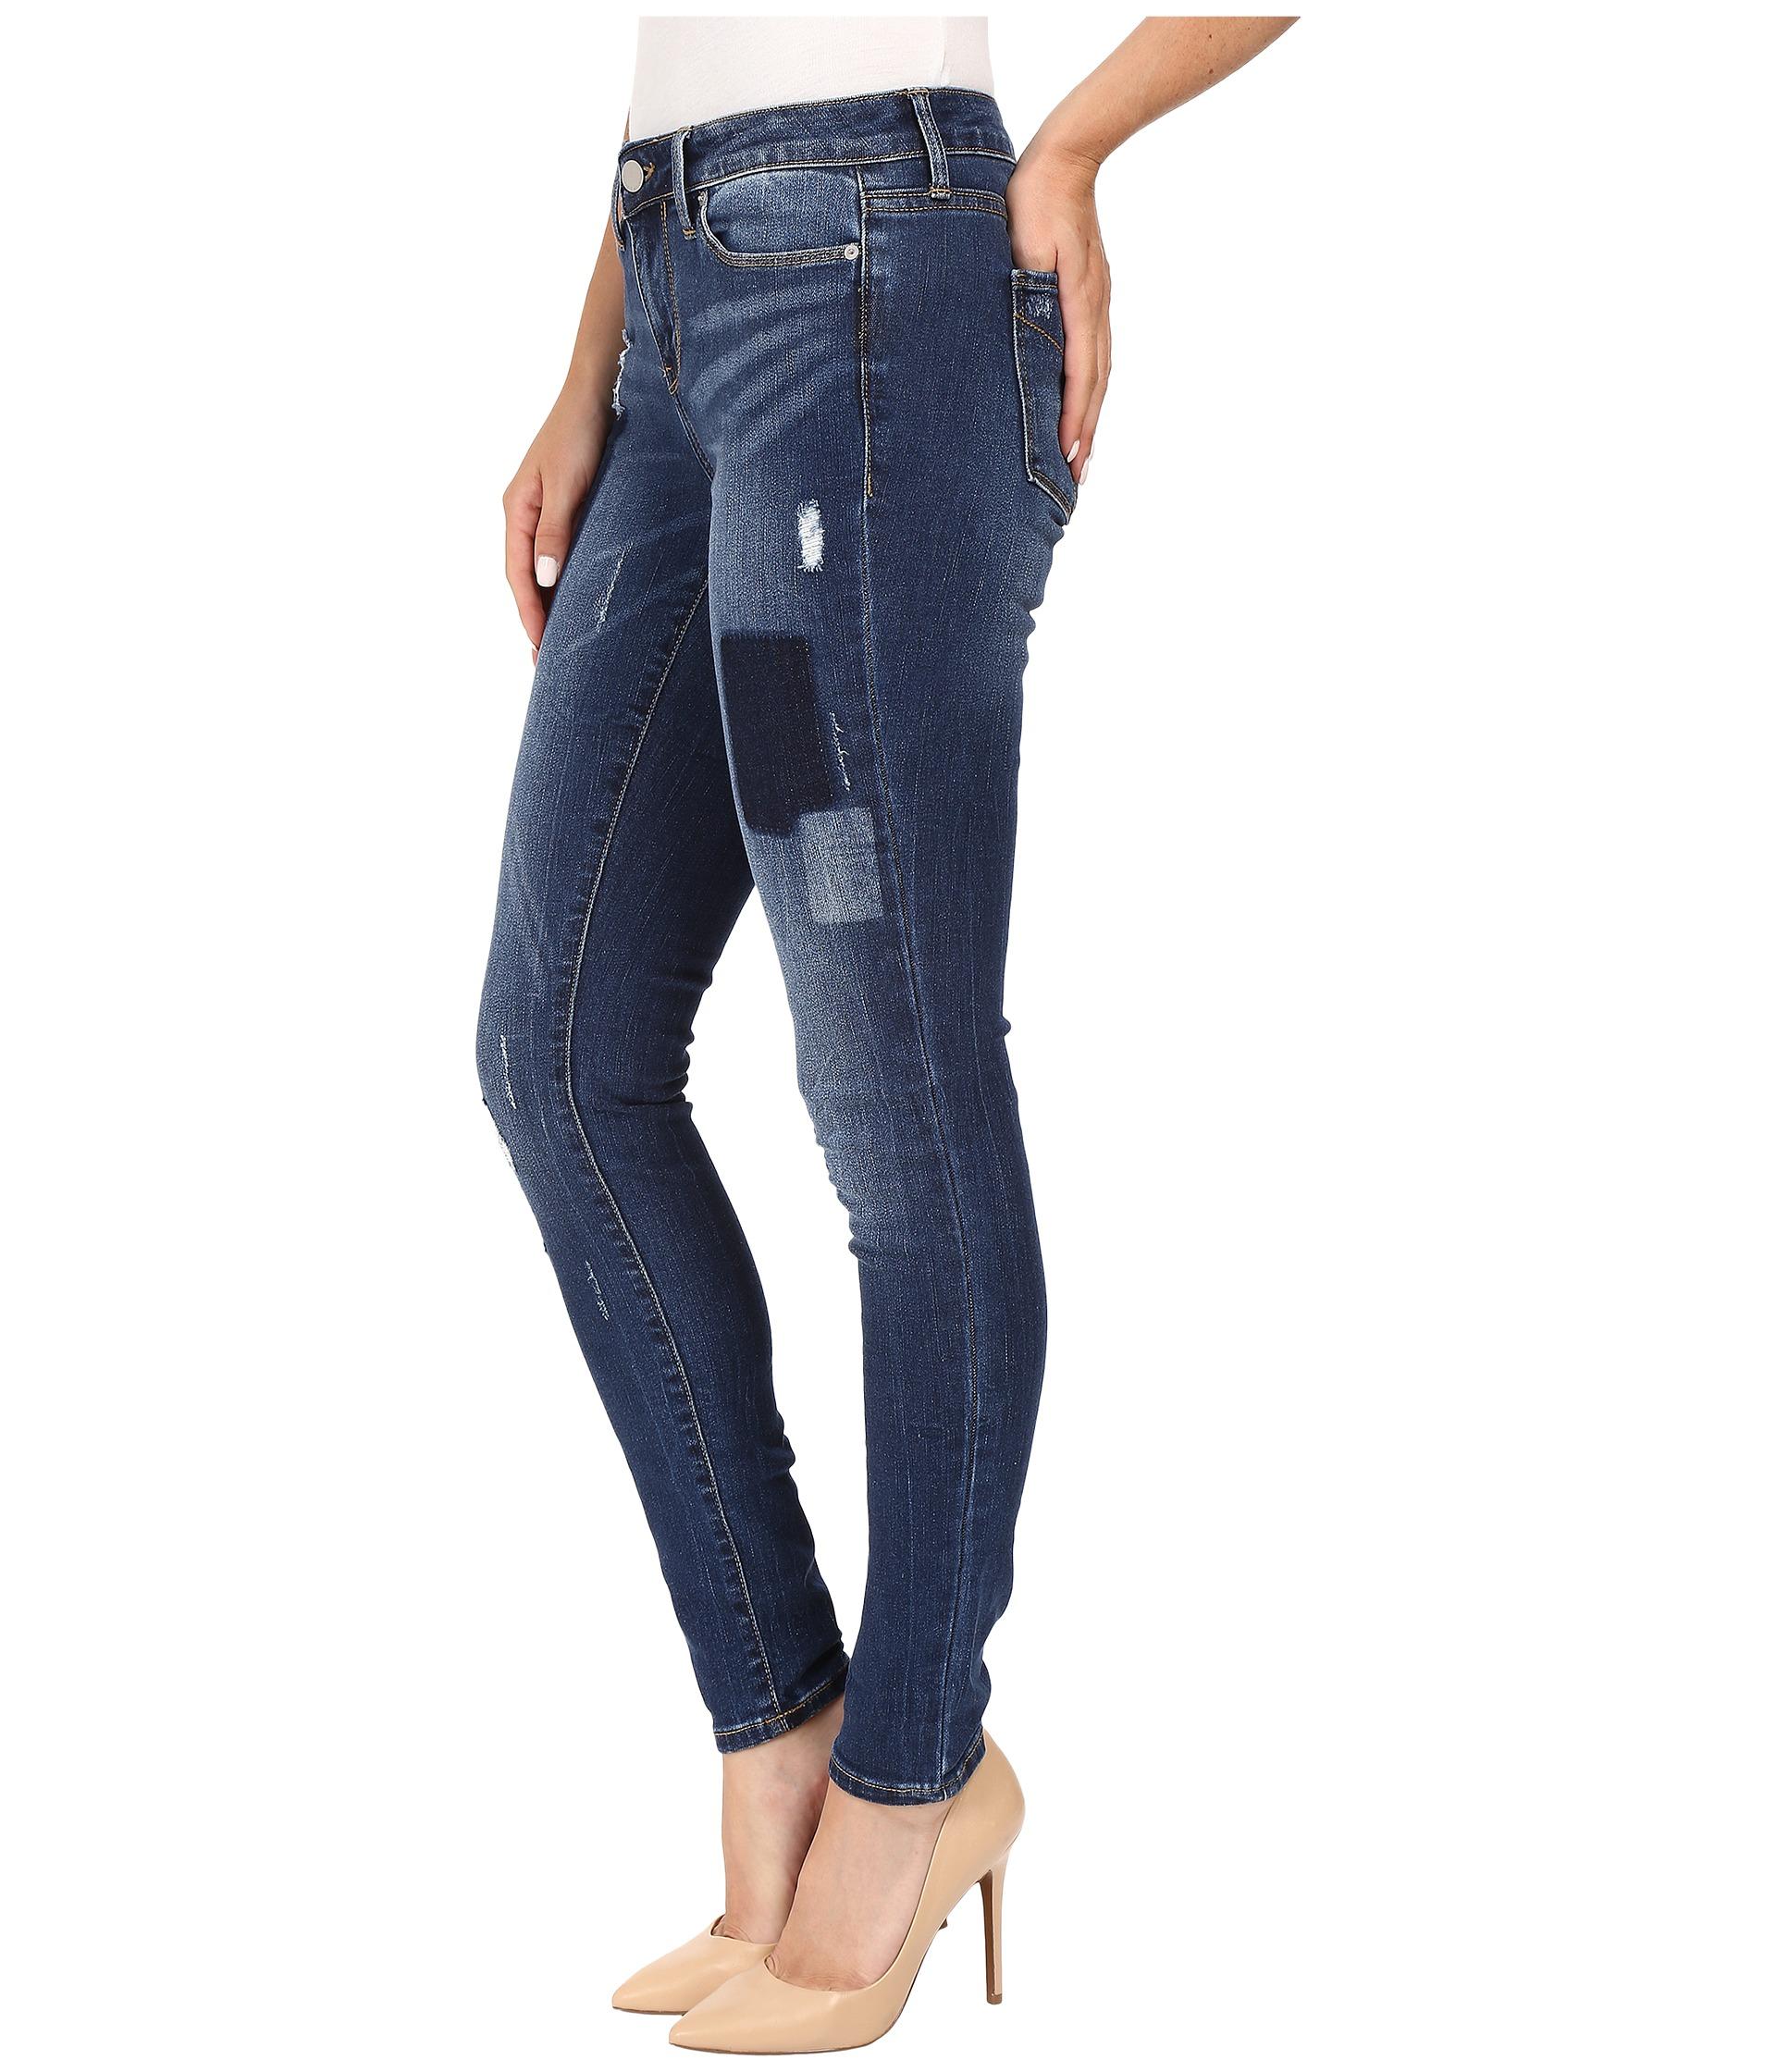 calvin klein jeans leggings in patchwork indigo free shipping both ways. Black Bedroom Furniture Sets. Home Design Ideas